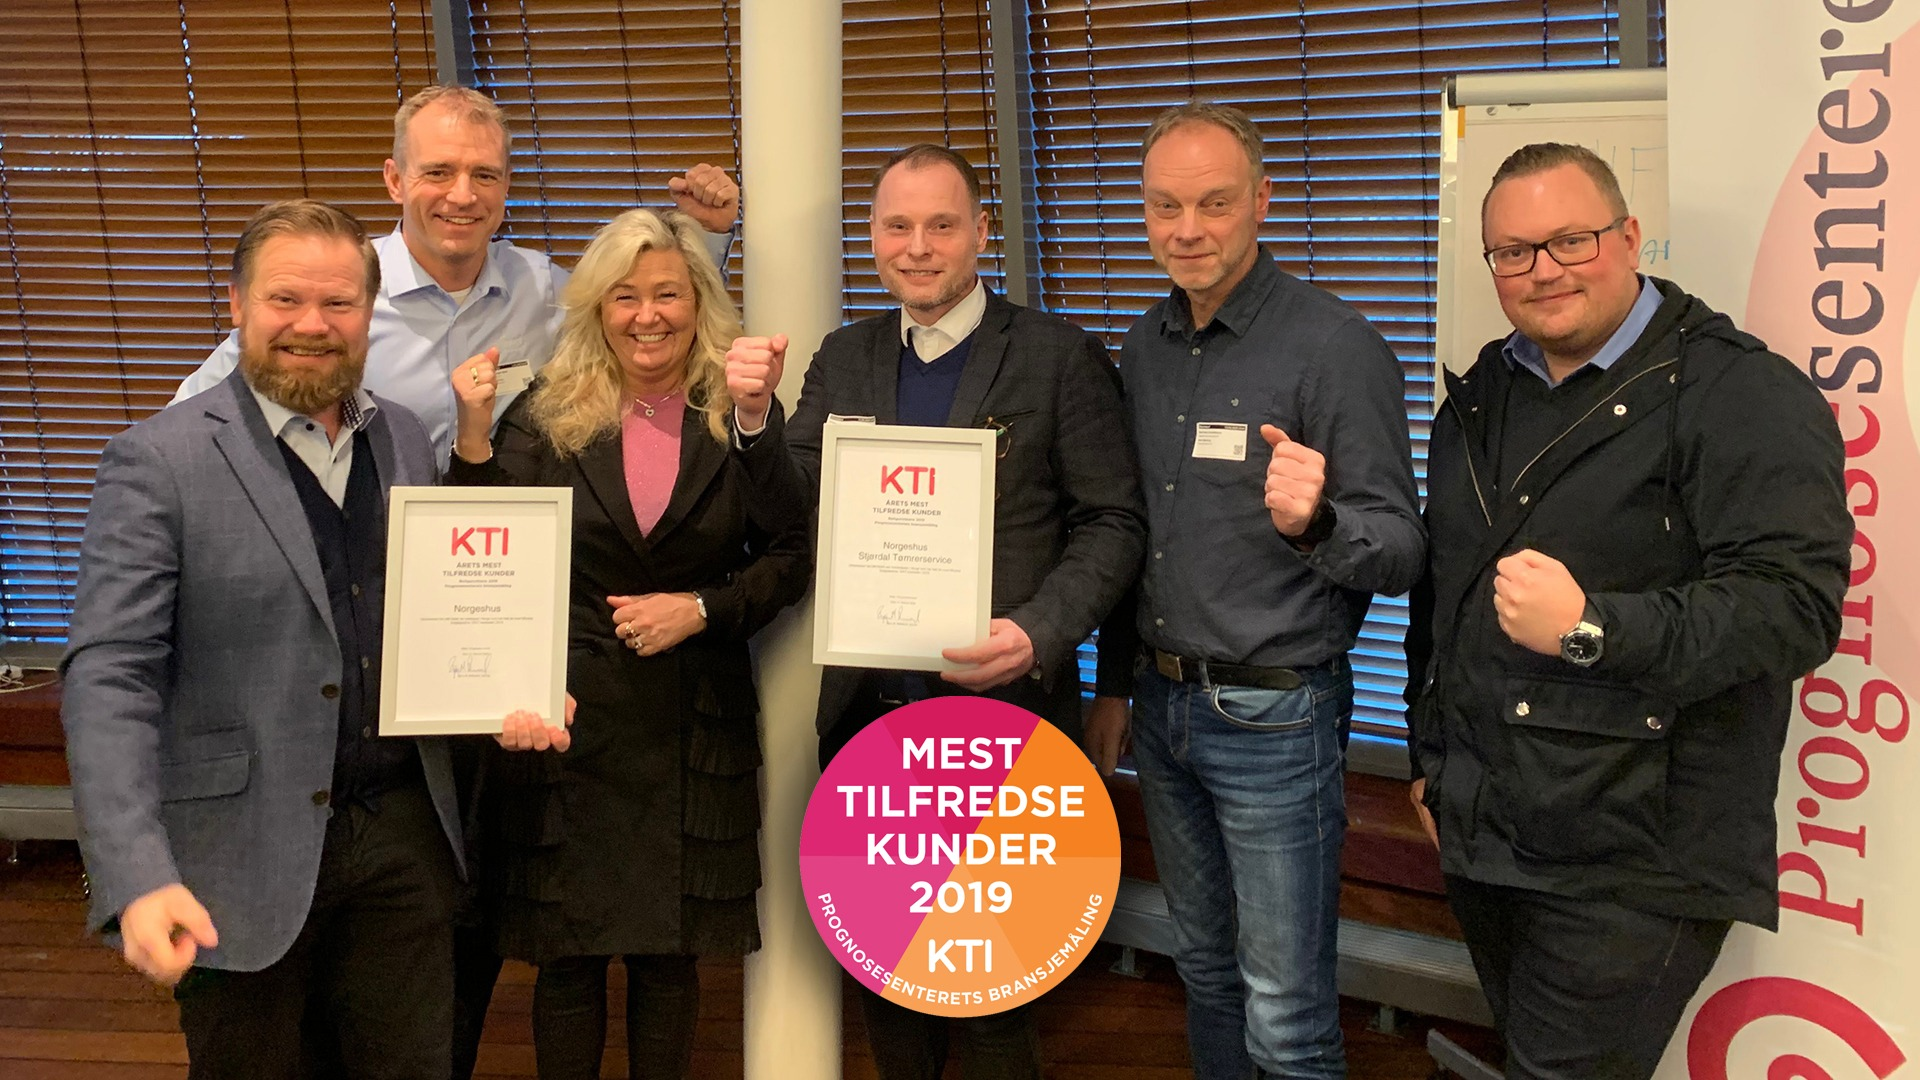 f.v: Frode Holm, Benn Asgeir Båtvik, Kjellrun Båtvik Hagensli, Anders Teigen, Rolf Arne Kristoffersen, Casper Arntzen